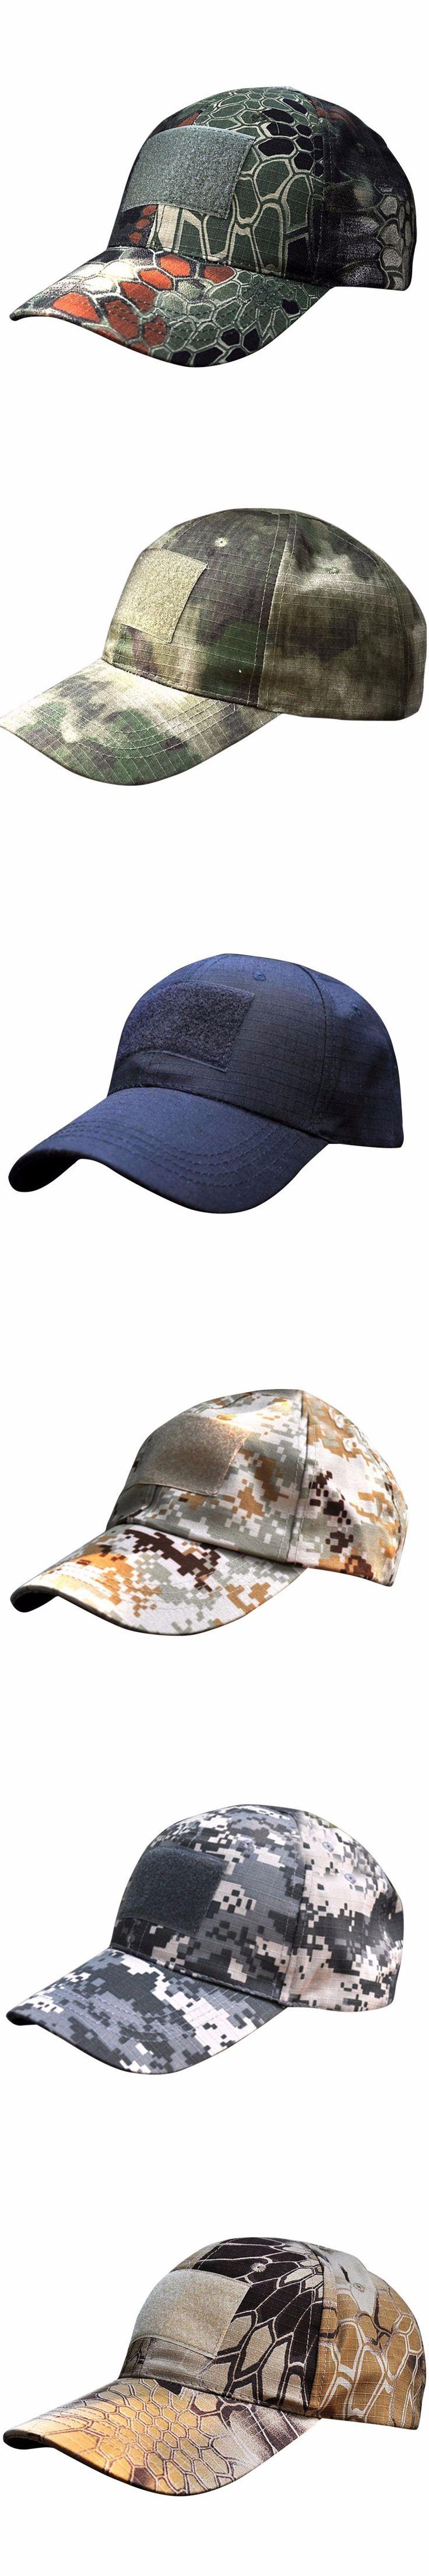 2017 Women Men Unisex Tactical Snapback Baseball Hat American US Flag Patch Hip Hop Caps Hats V2 A7 A8